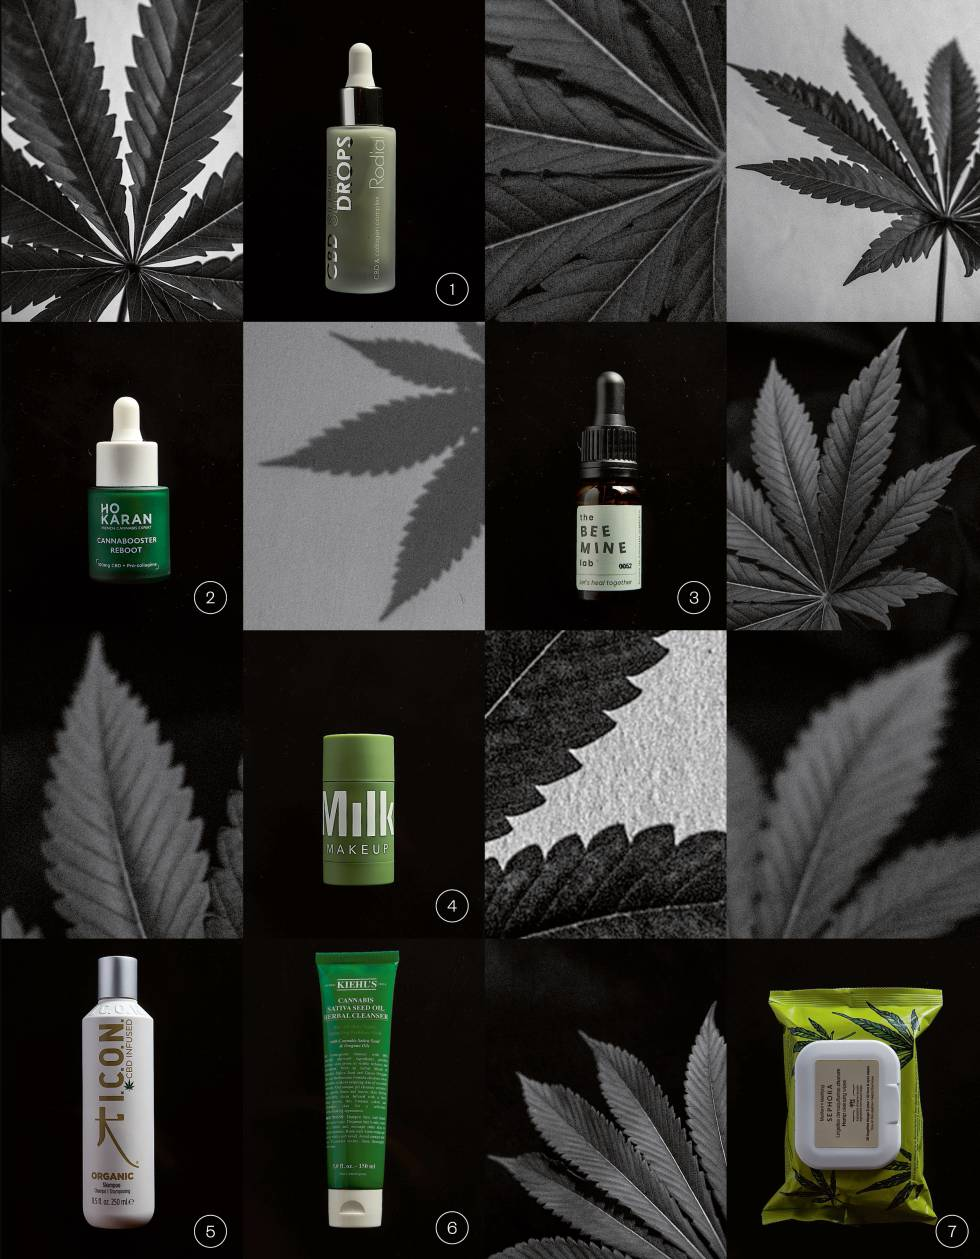 Marihuana para cuidarte; marihuana para embellecerte